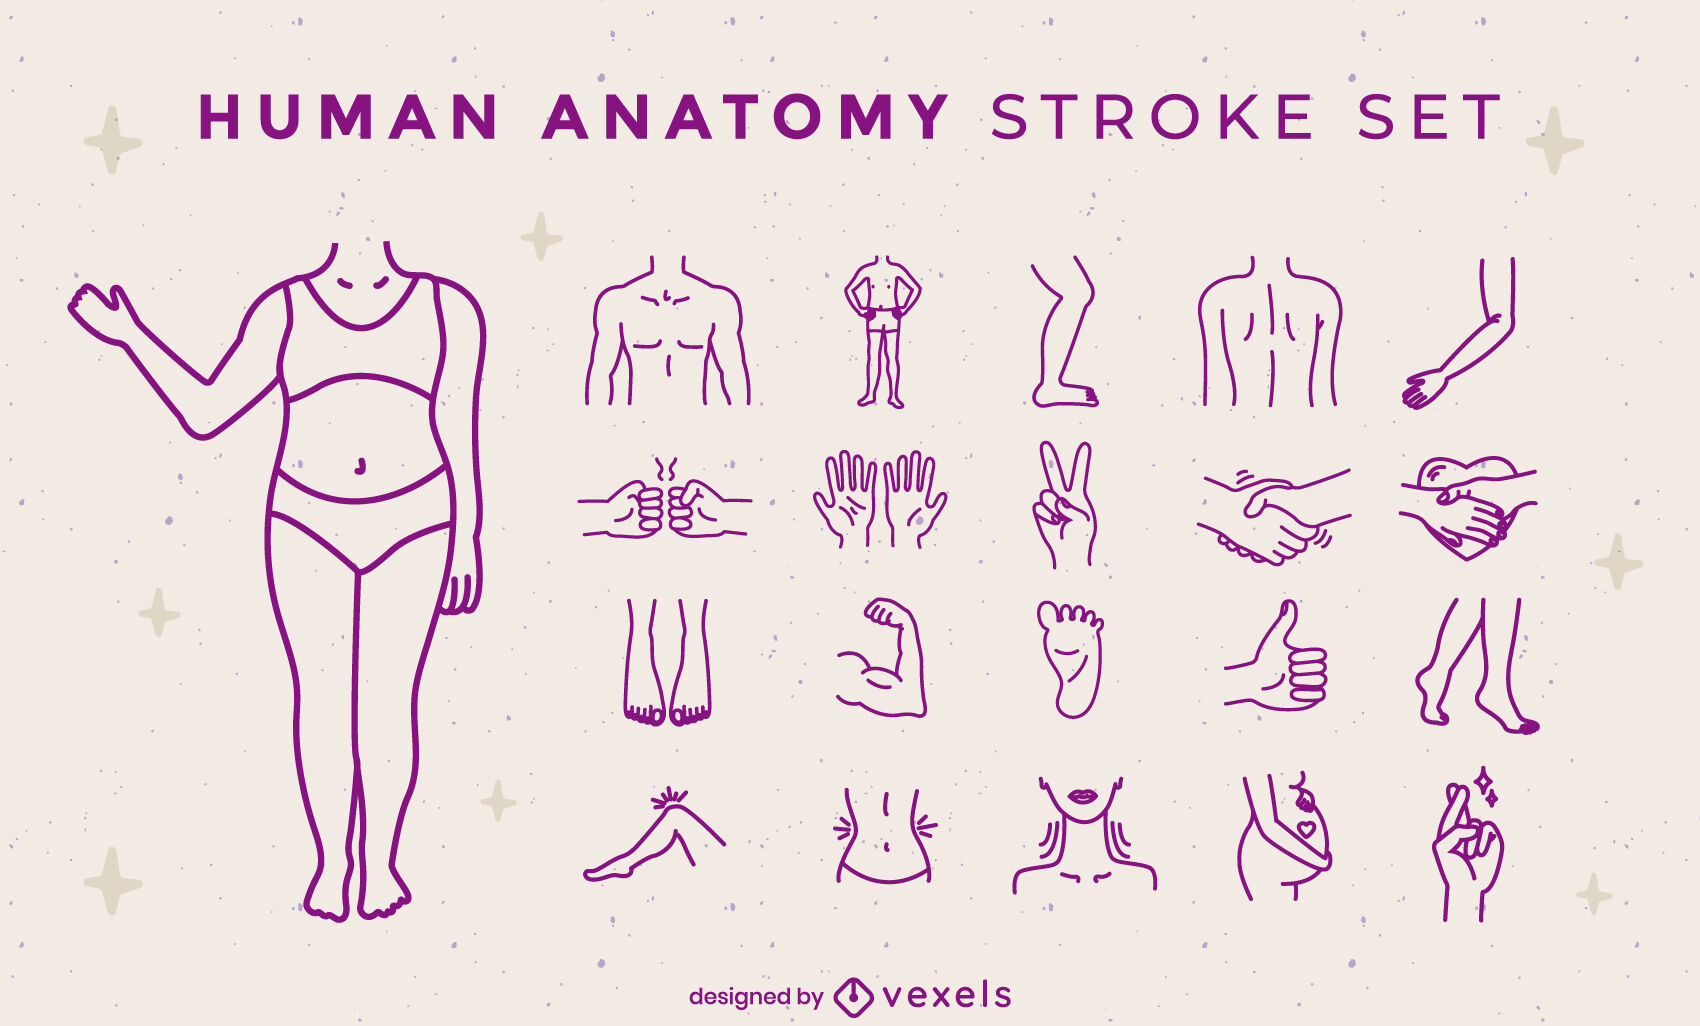 Human anatomy body parts stroke set